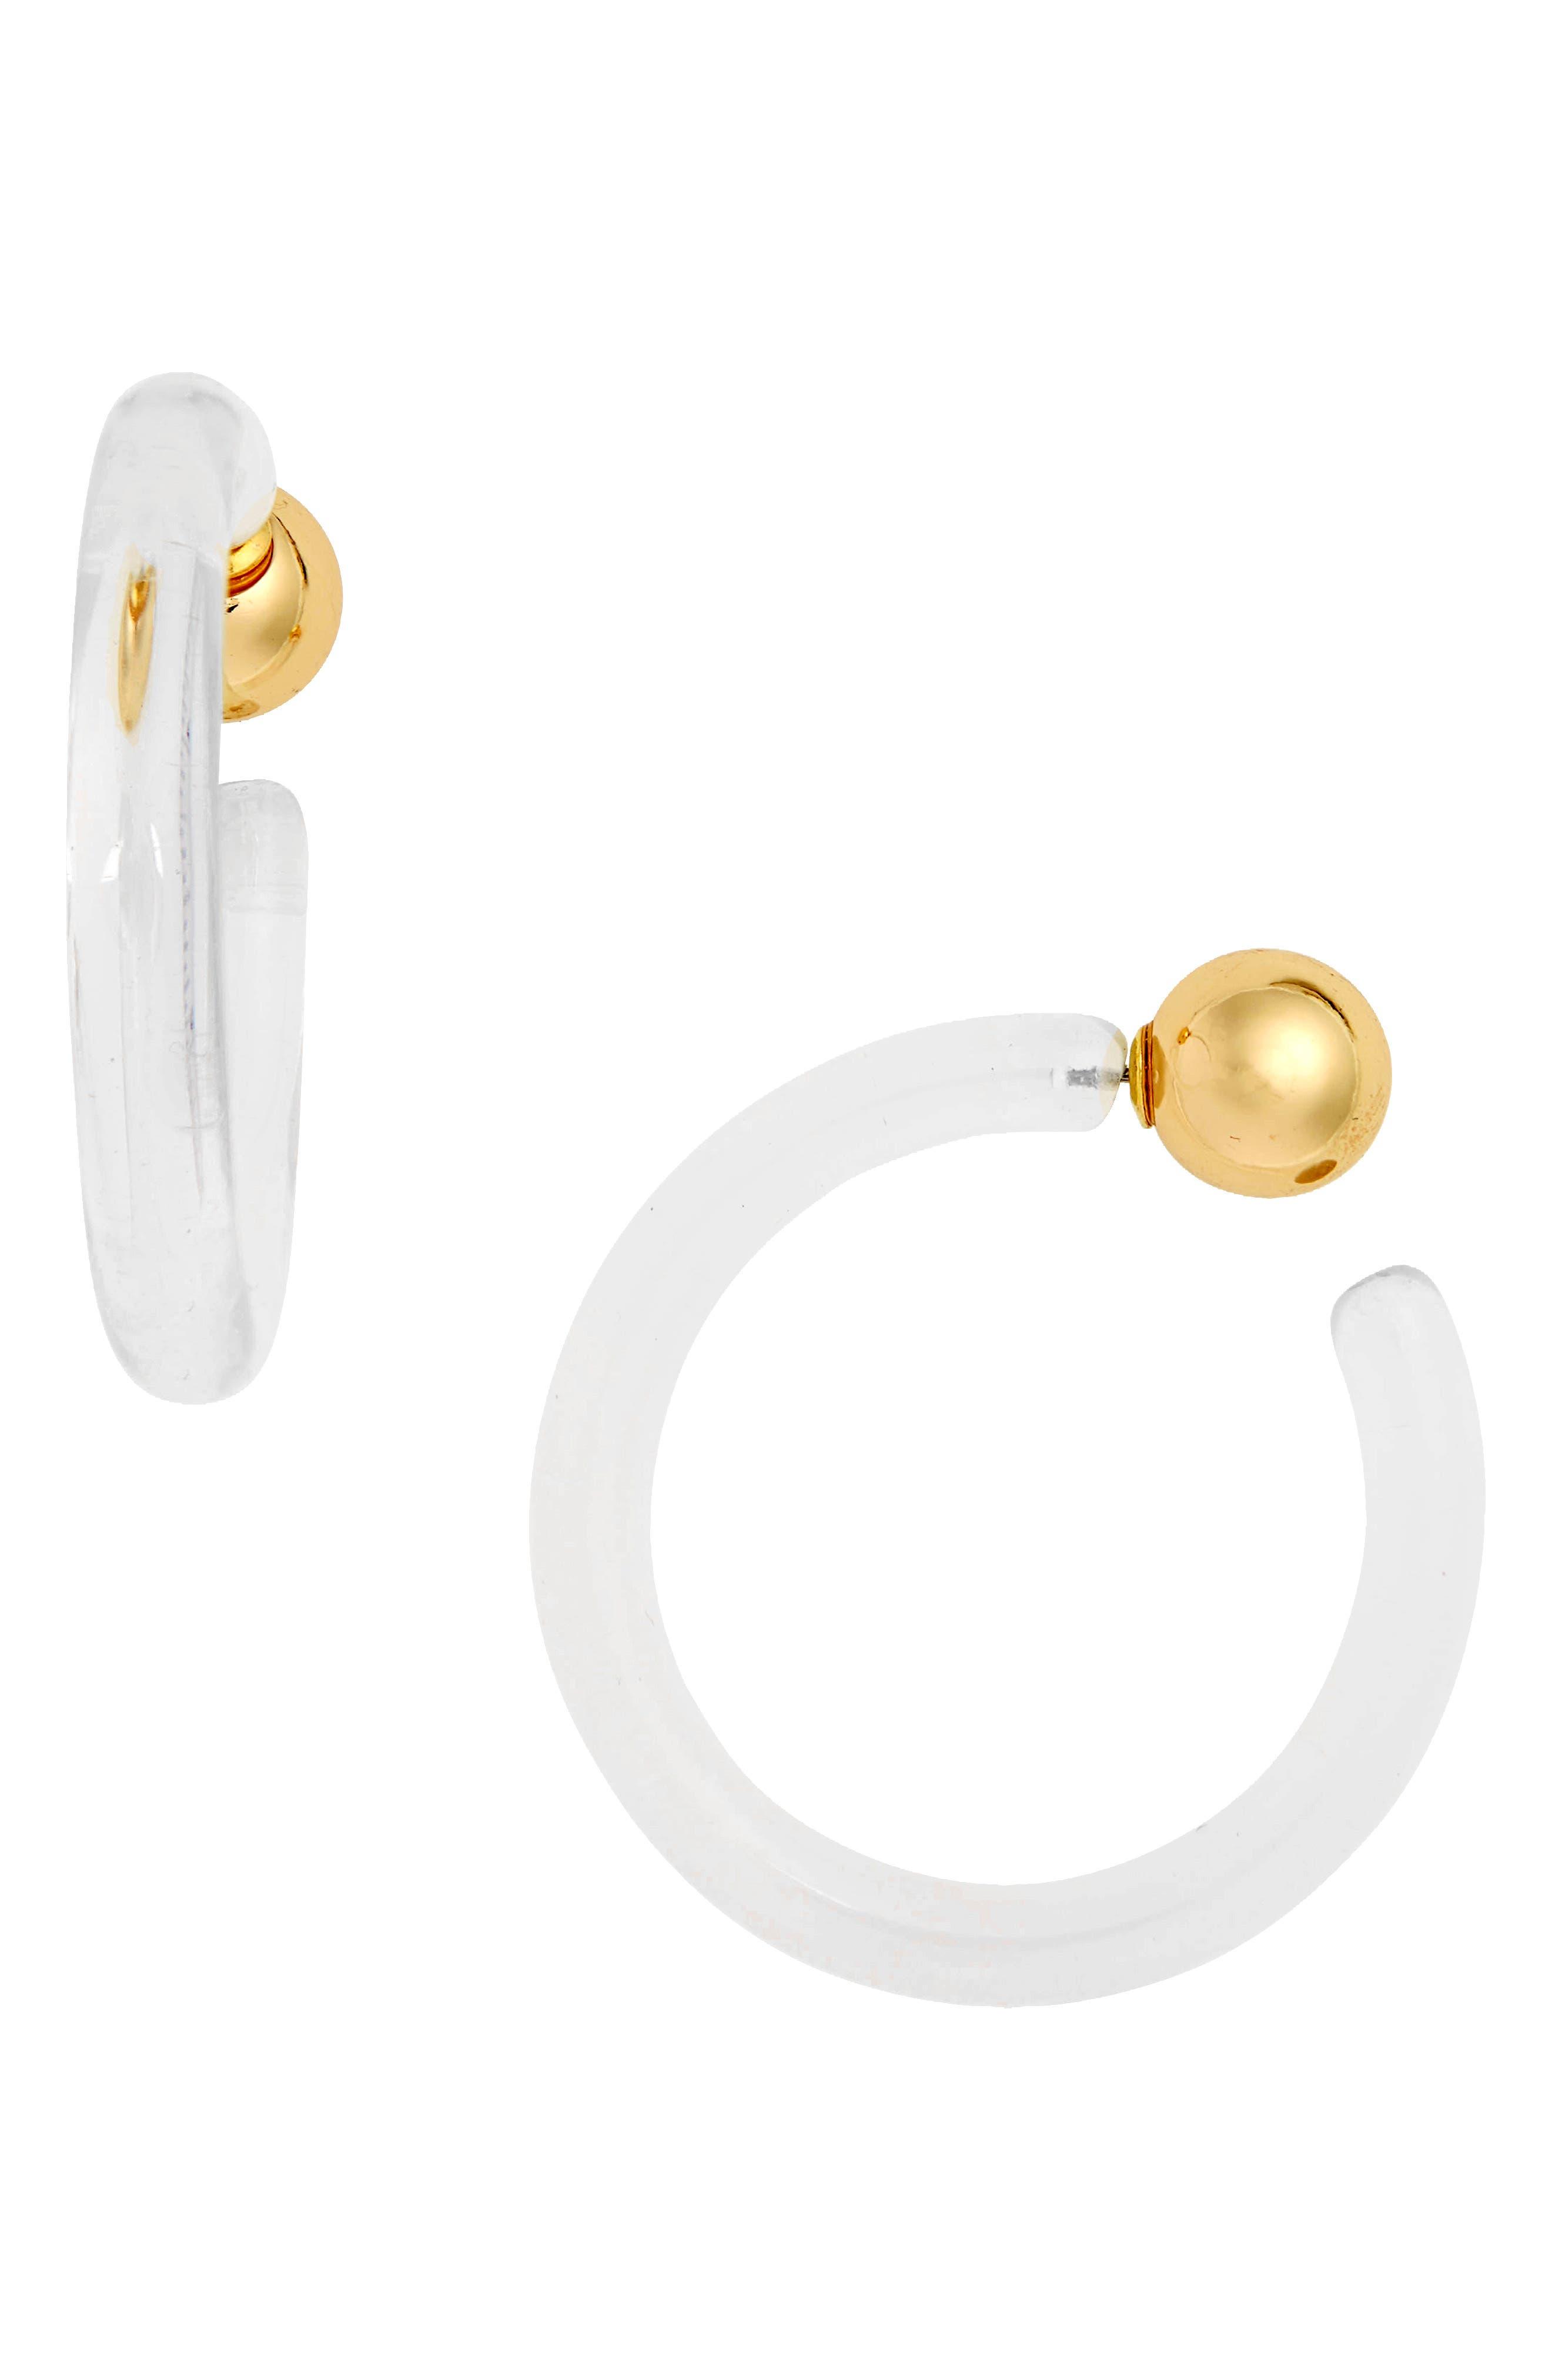 Clear Hoop Ear Jackets,                             Main thumbnail 1, color,                             GOLD/ CLEAR